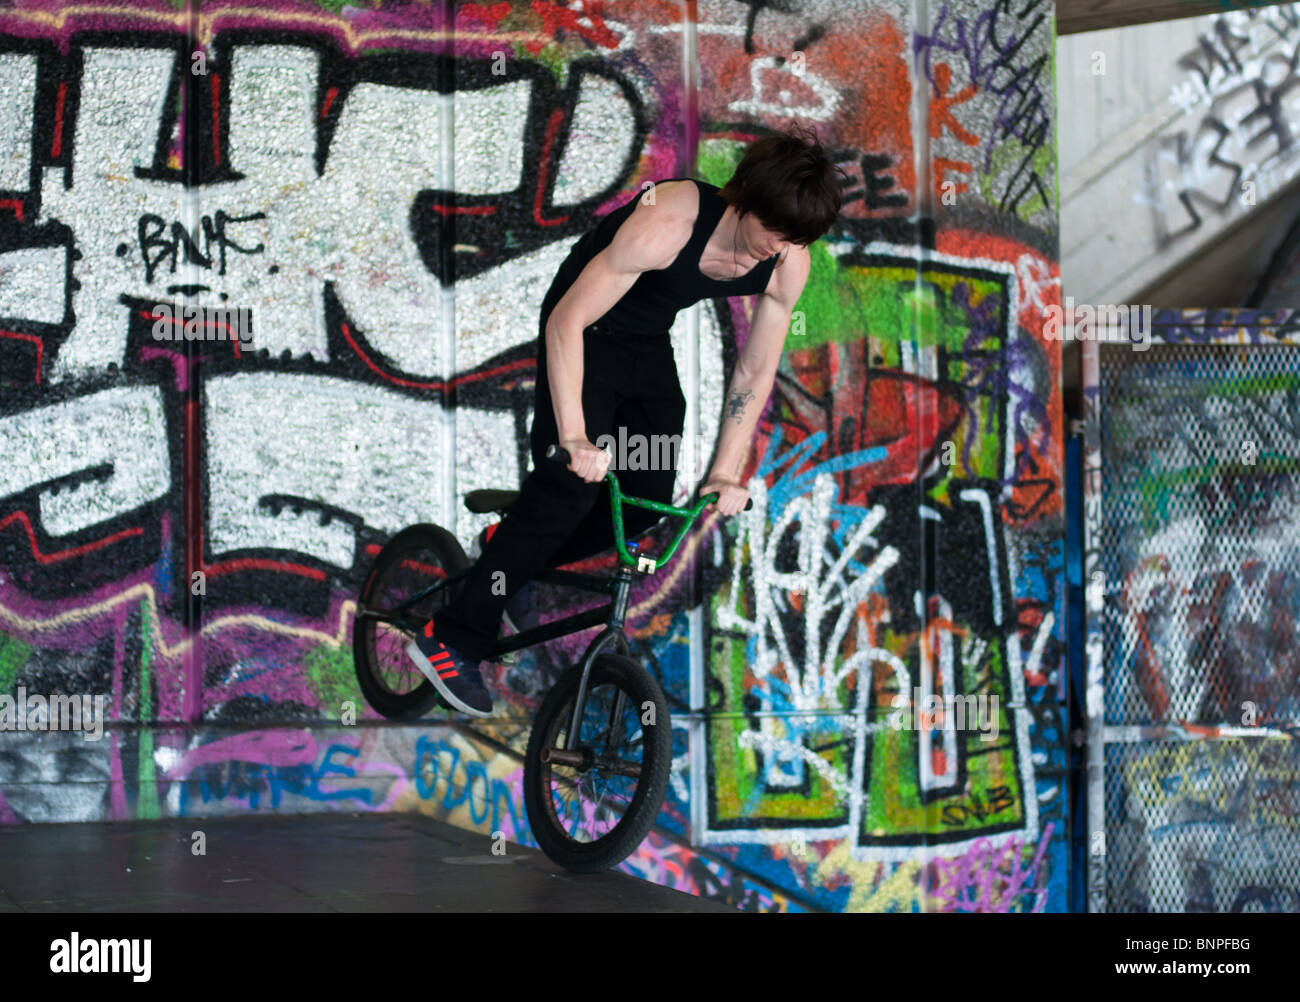 Stunt biker at Southbank, London - Stock Image